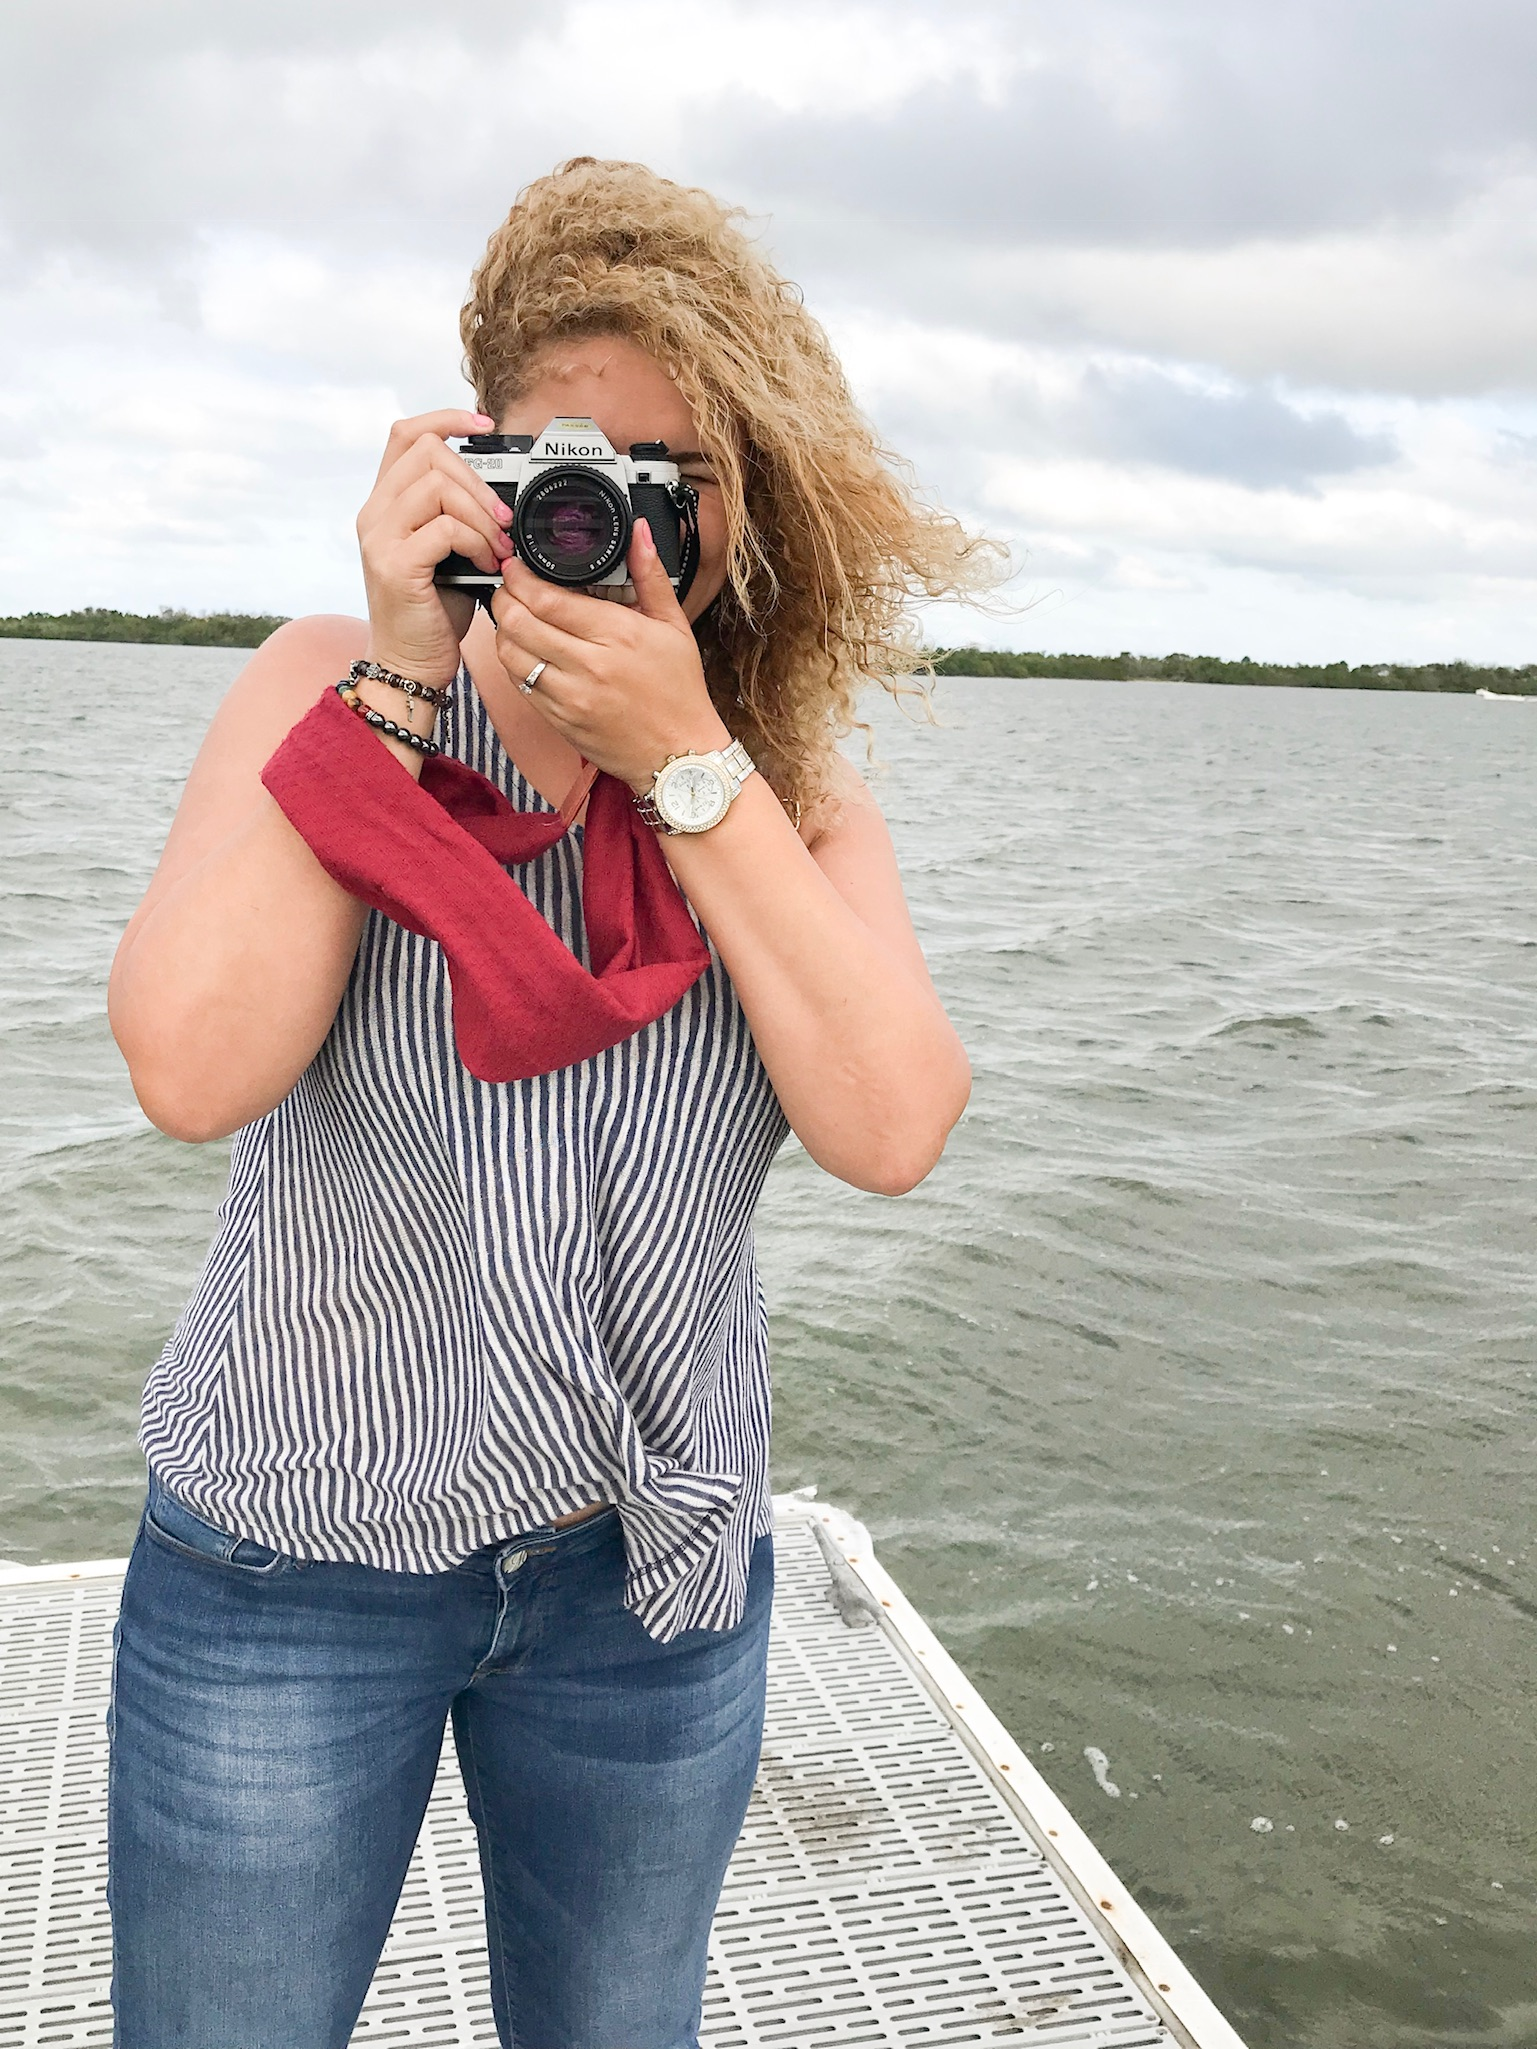 Orlando photographer Yanitza Ninett